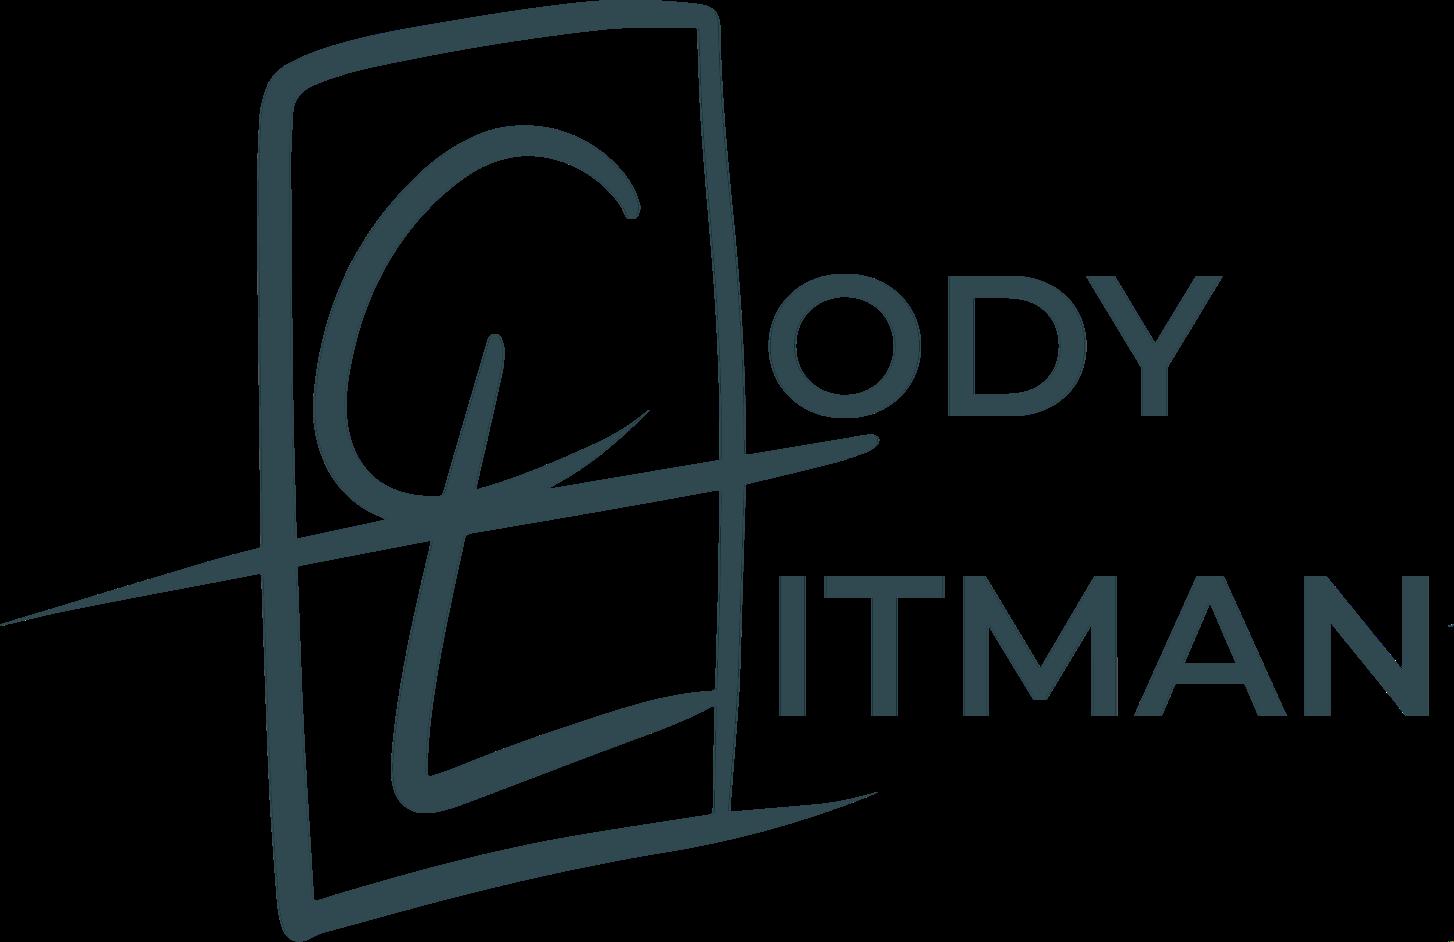 Cody Litman